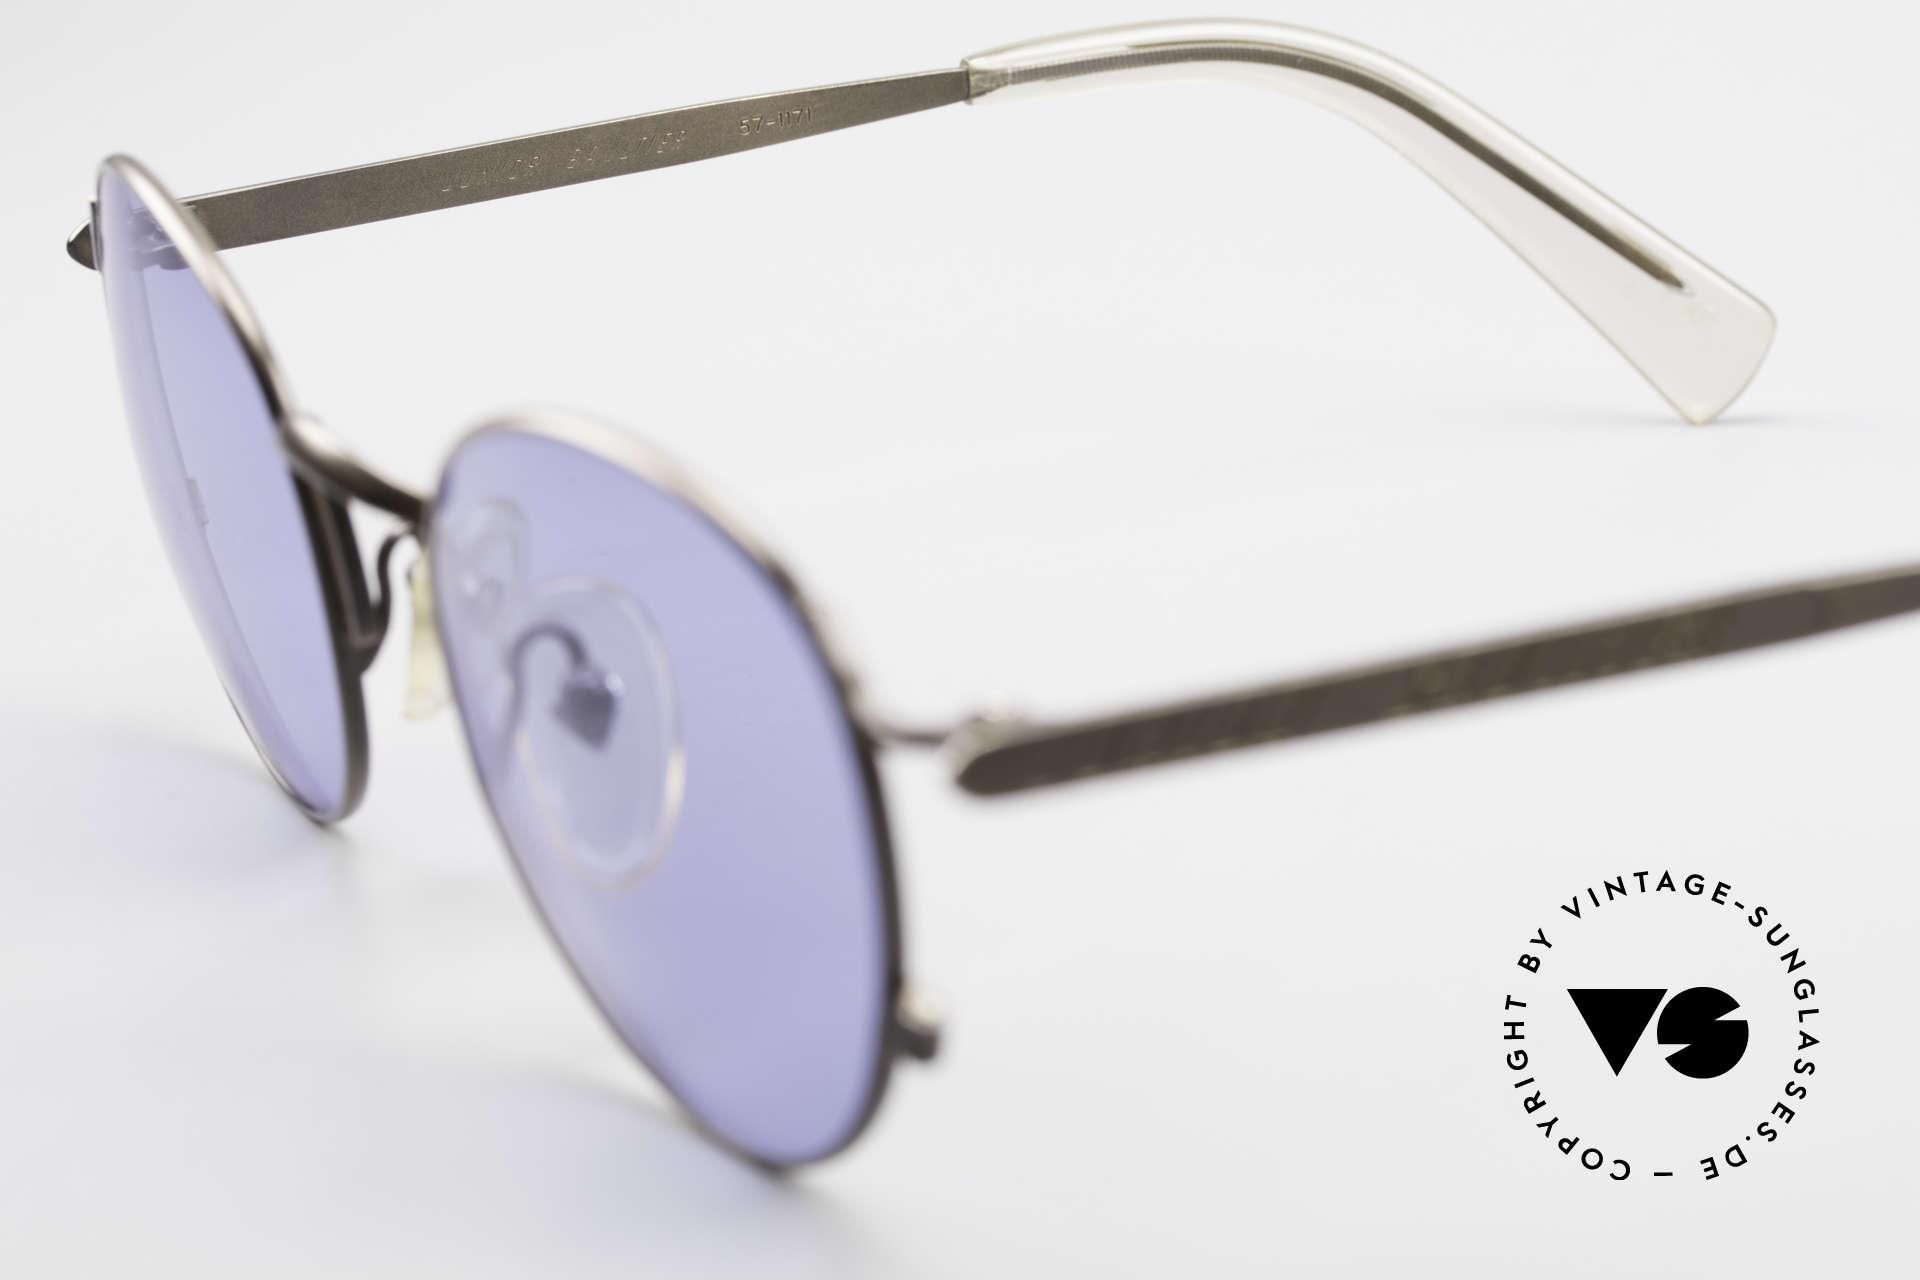 Jean Paul Gaultier 57-1171 90's Designer Sunglasses JPG, Size: medium, Made for Men and Women